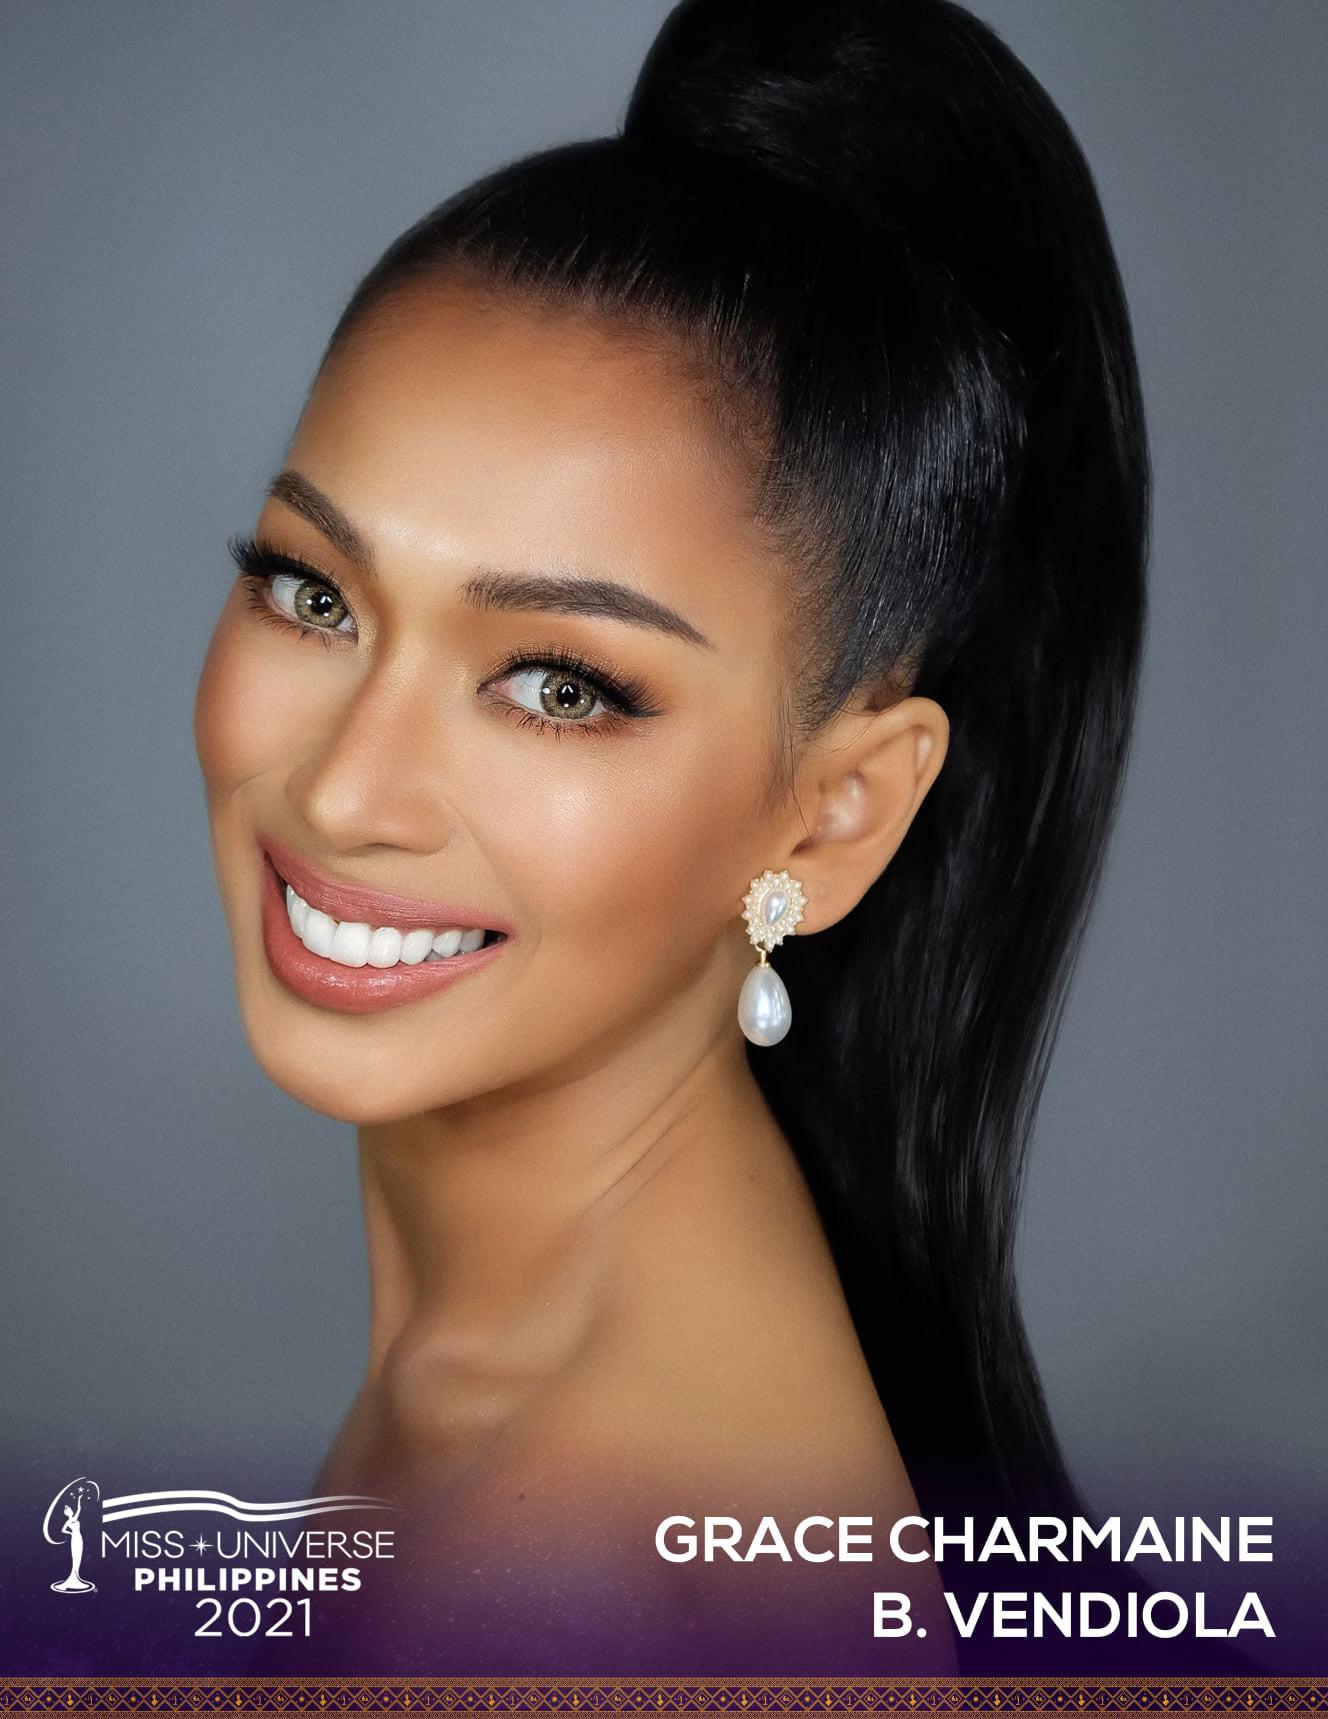 pre-candidatas a miss universe philippines 2021. - Página 5 Al7pkb